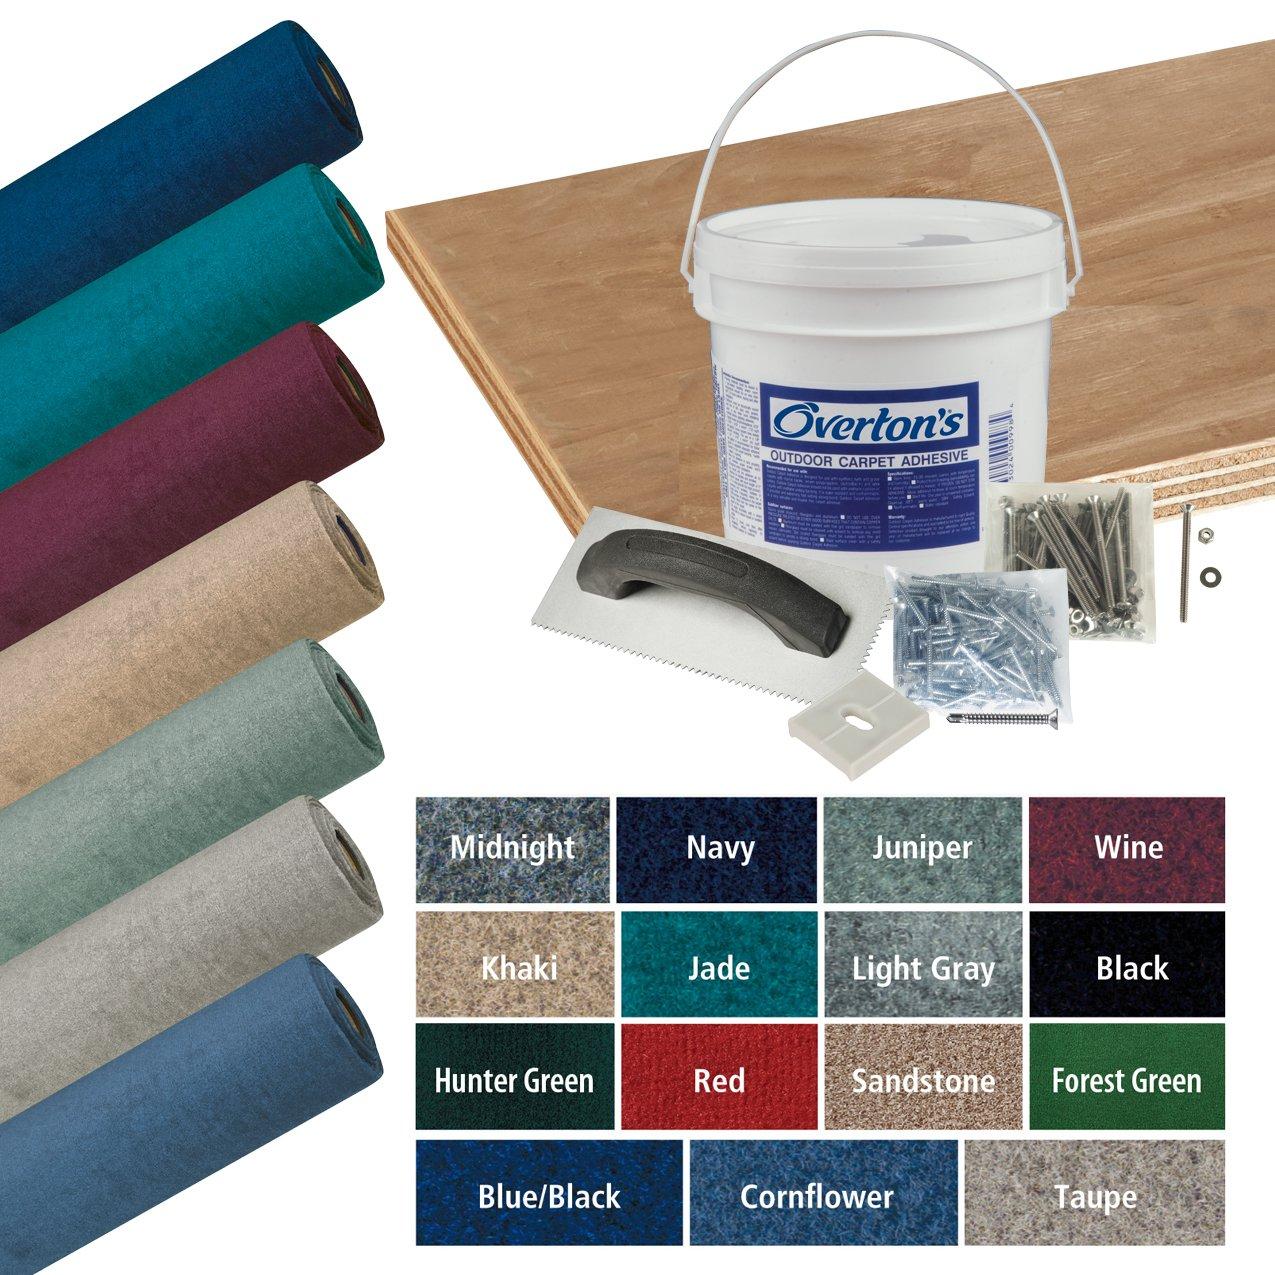 Overton's Daystar Carpet and Deck Kit, 8.5'W x 25'L